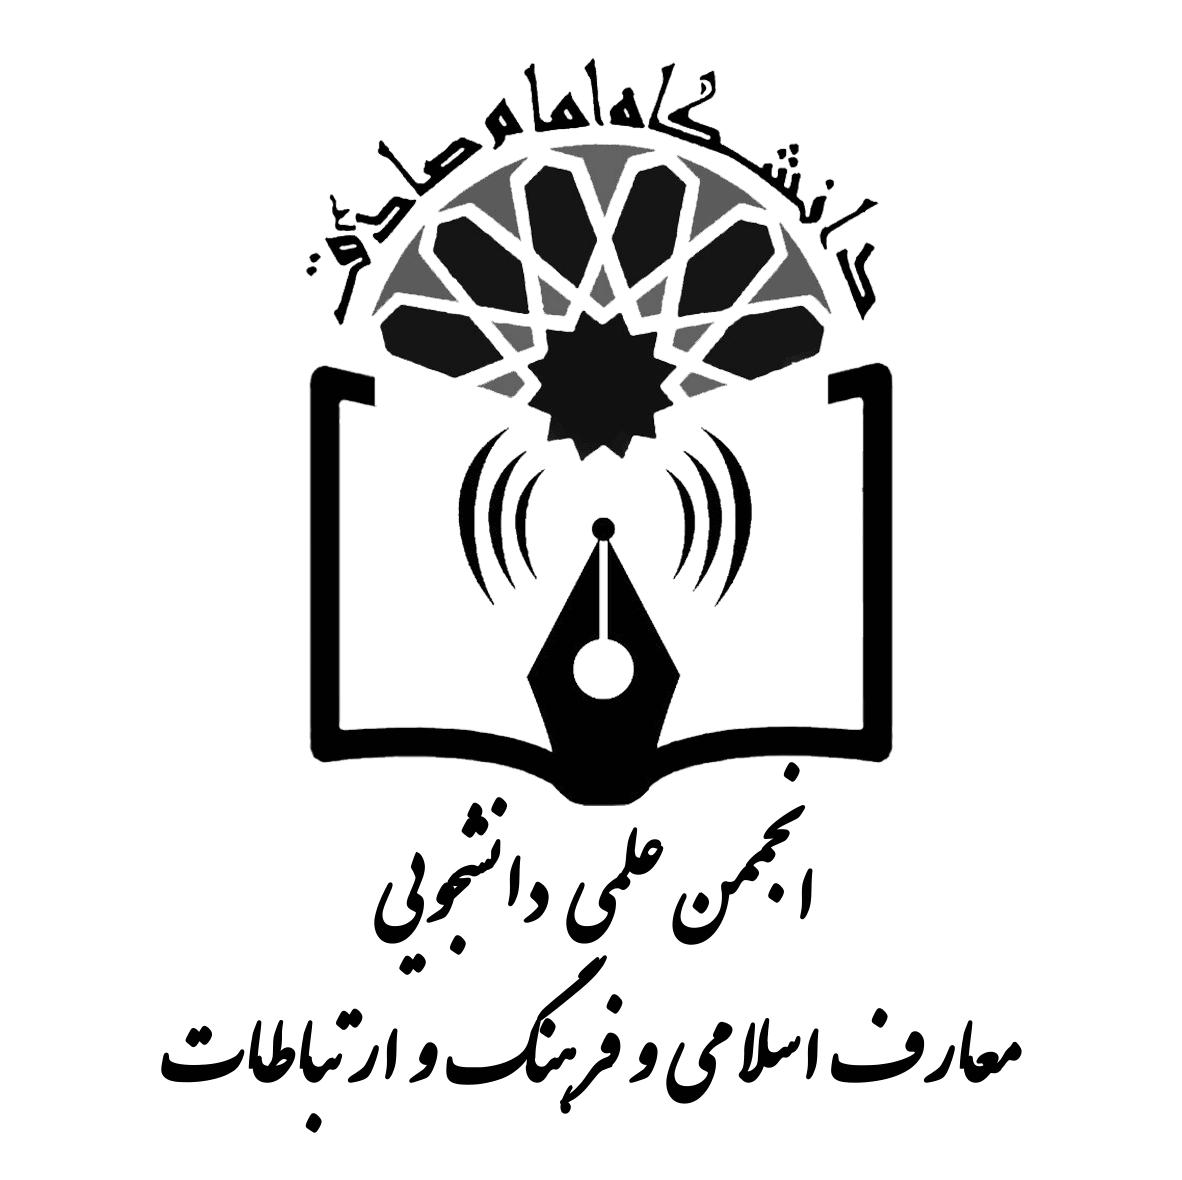 انجمن ارتباطات